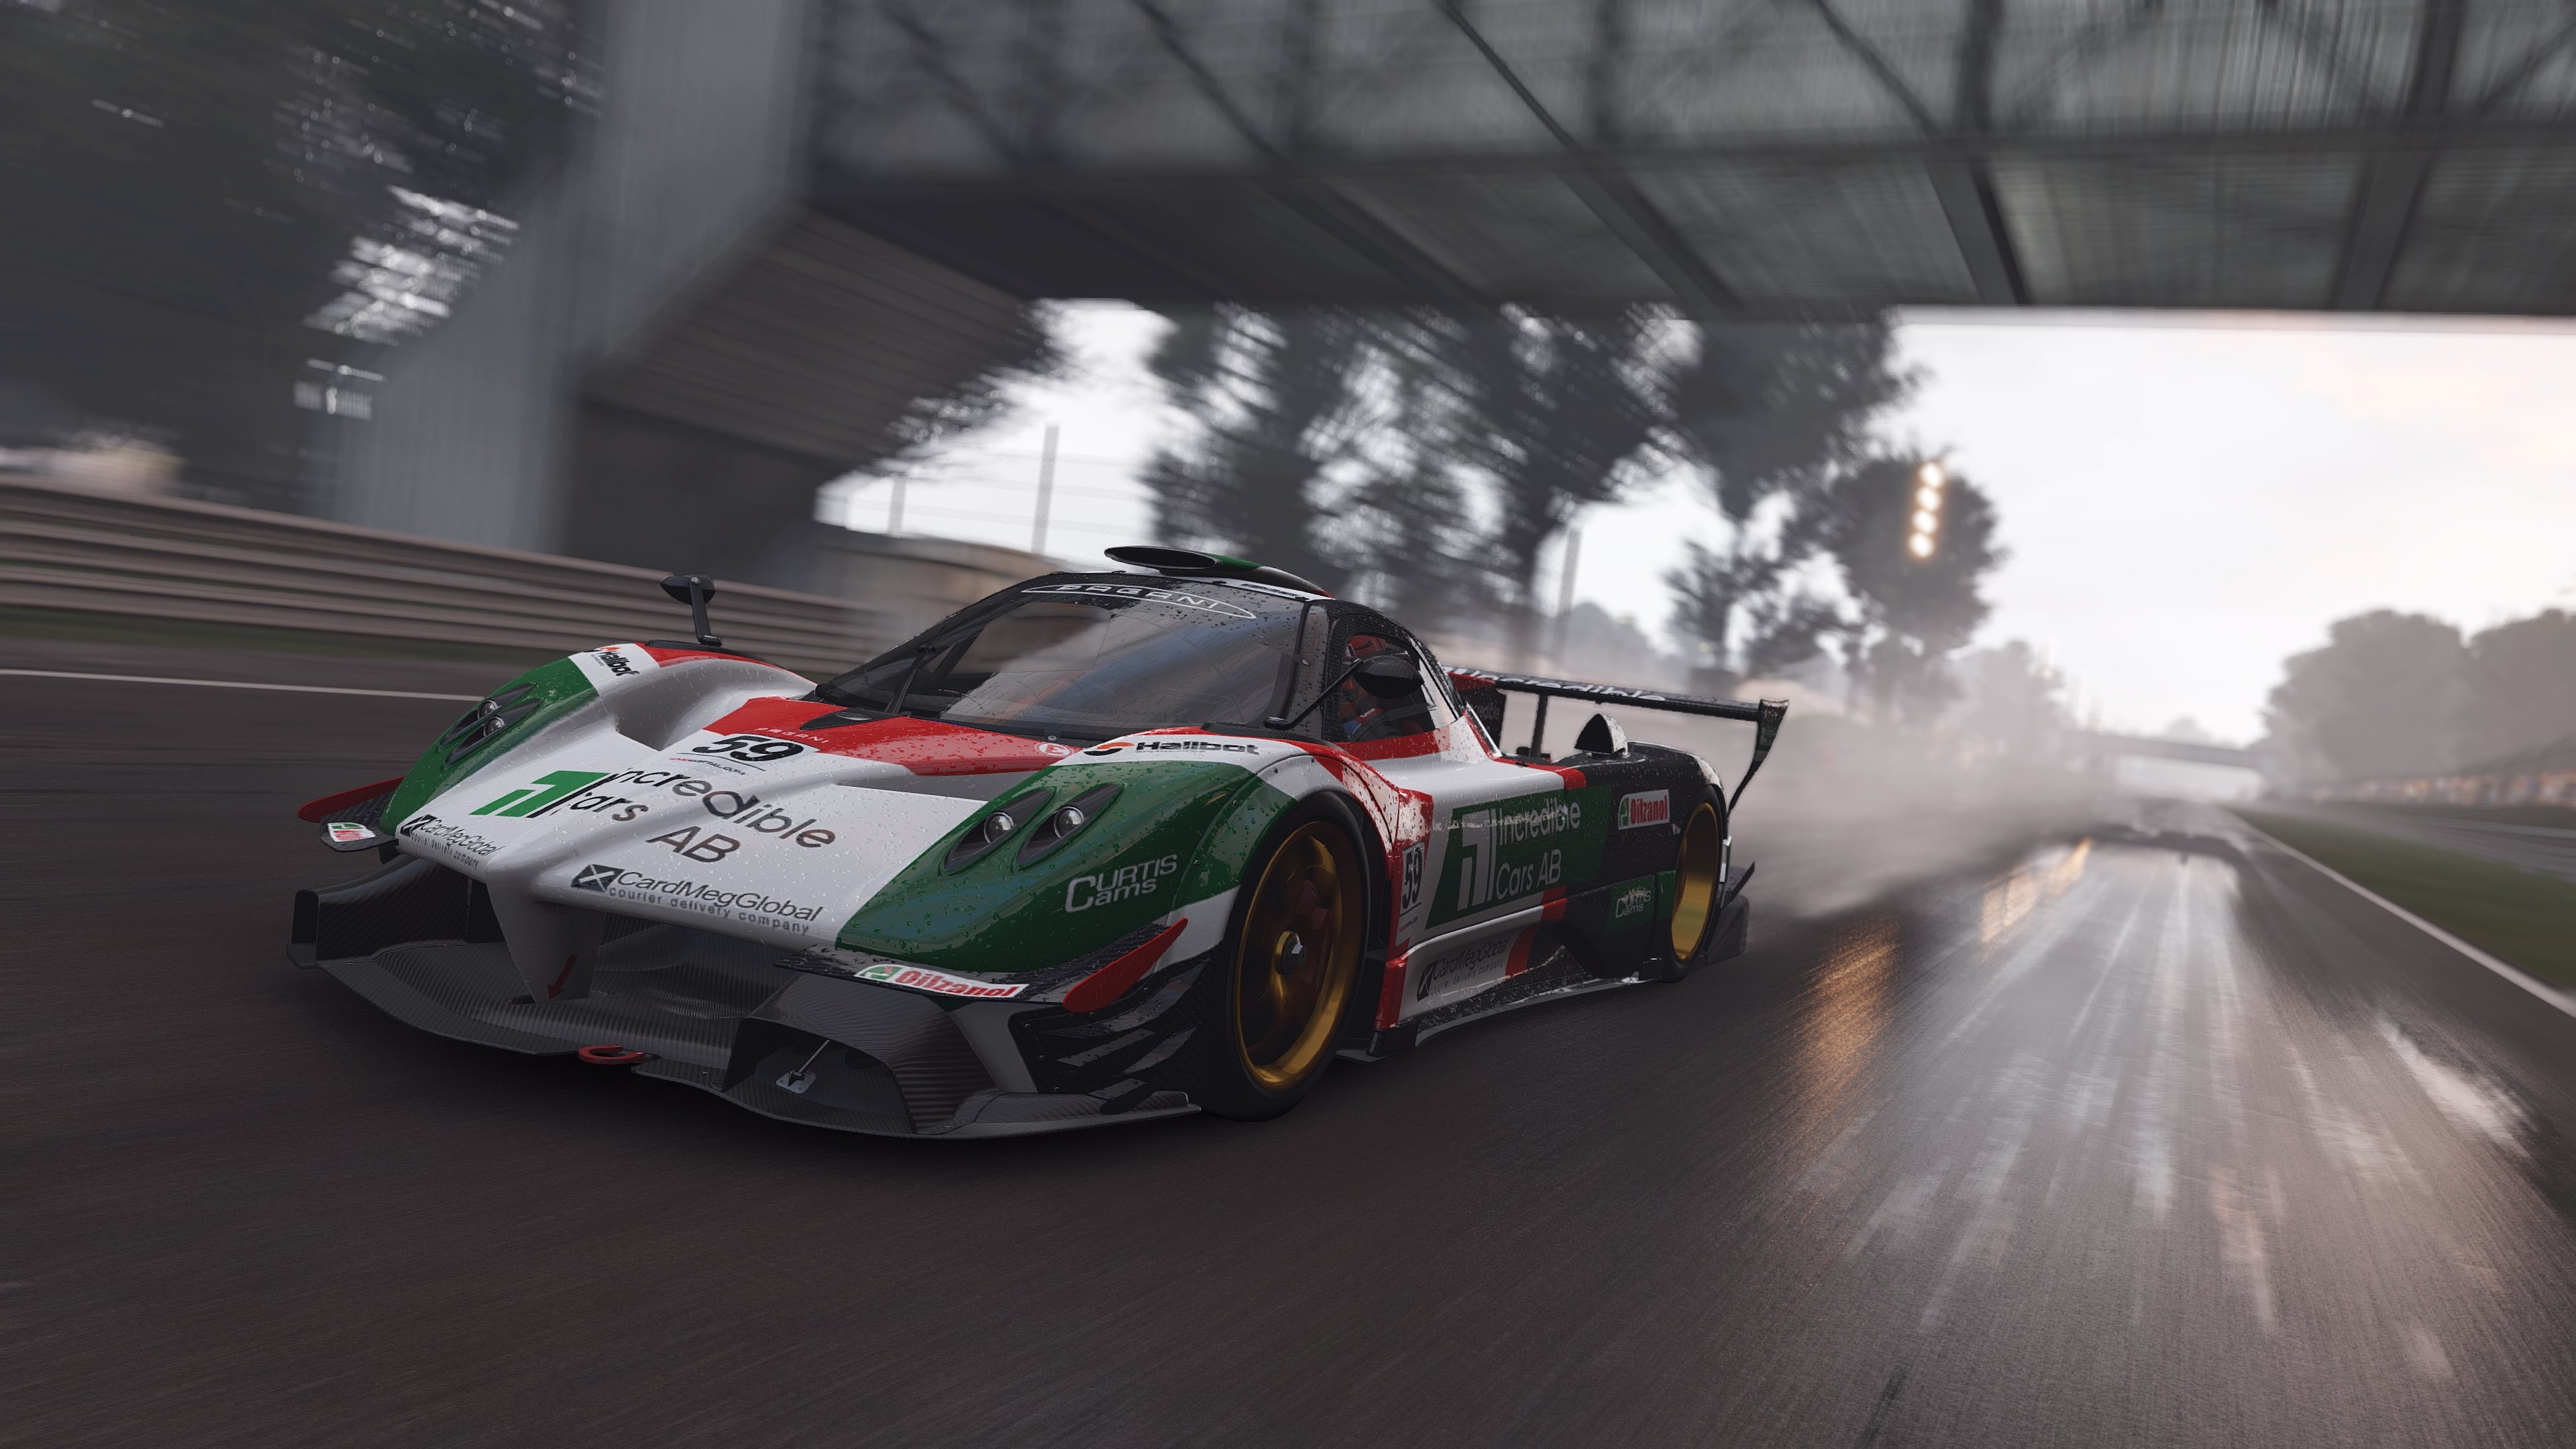 Project cars 2 soul of motorsport e3 2017 horizontal